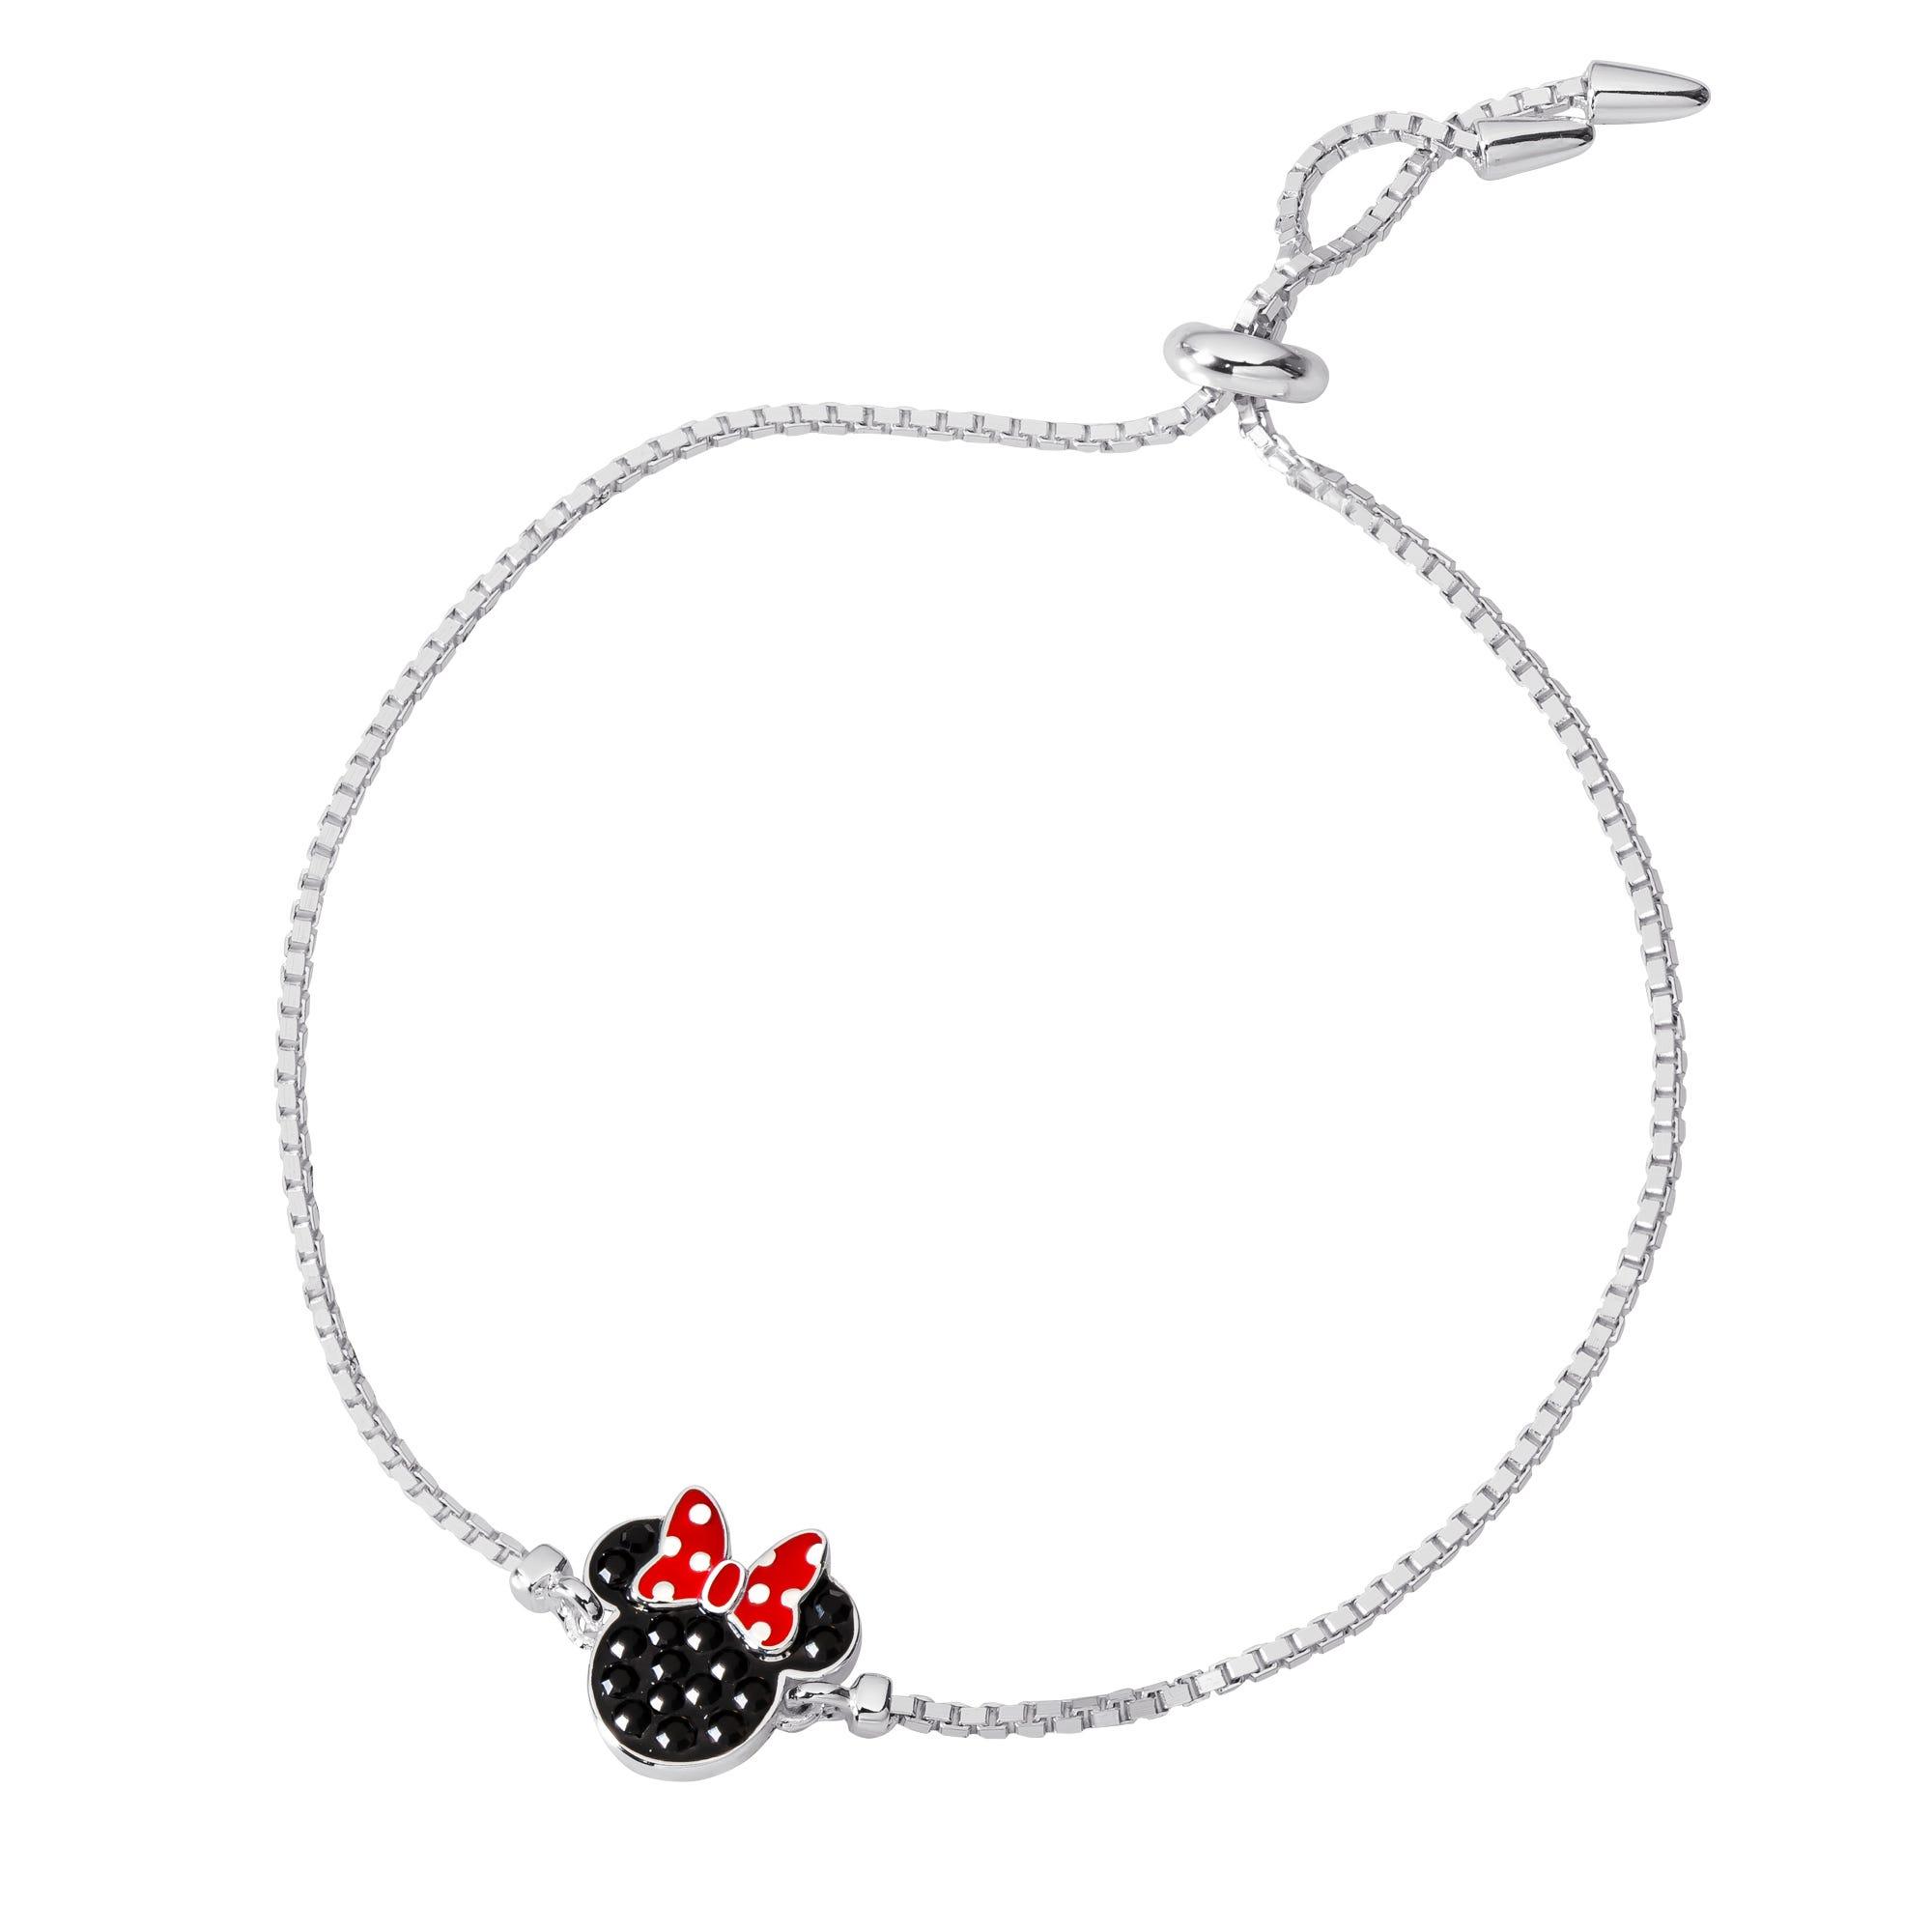 DISNEY© Minnie Mouse Bolo Bracelet in Sterling Silver